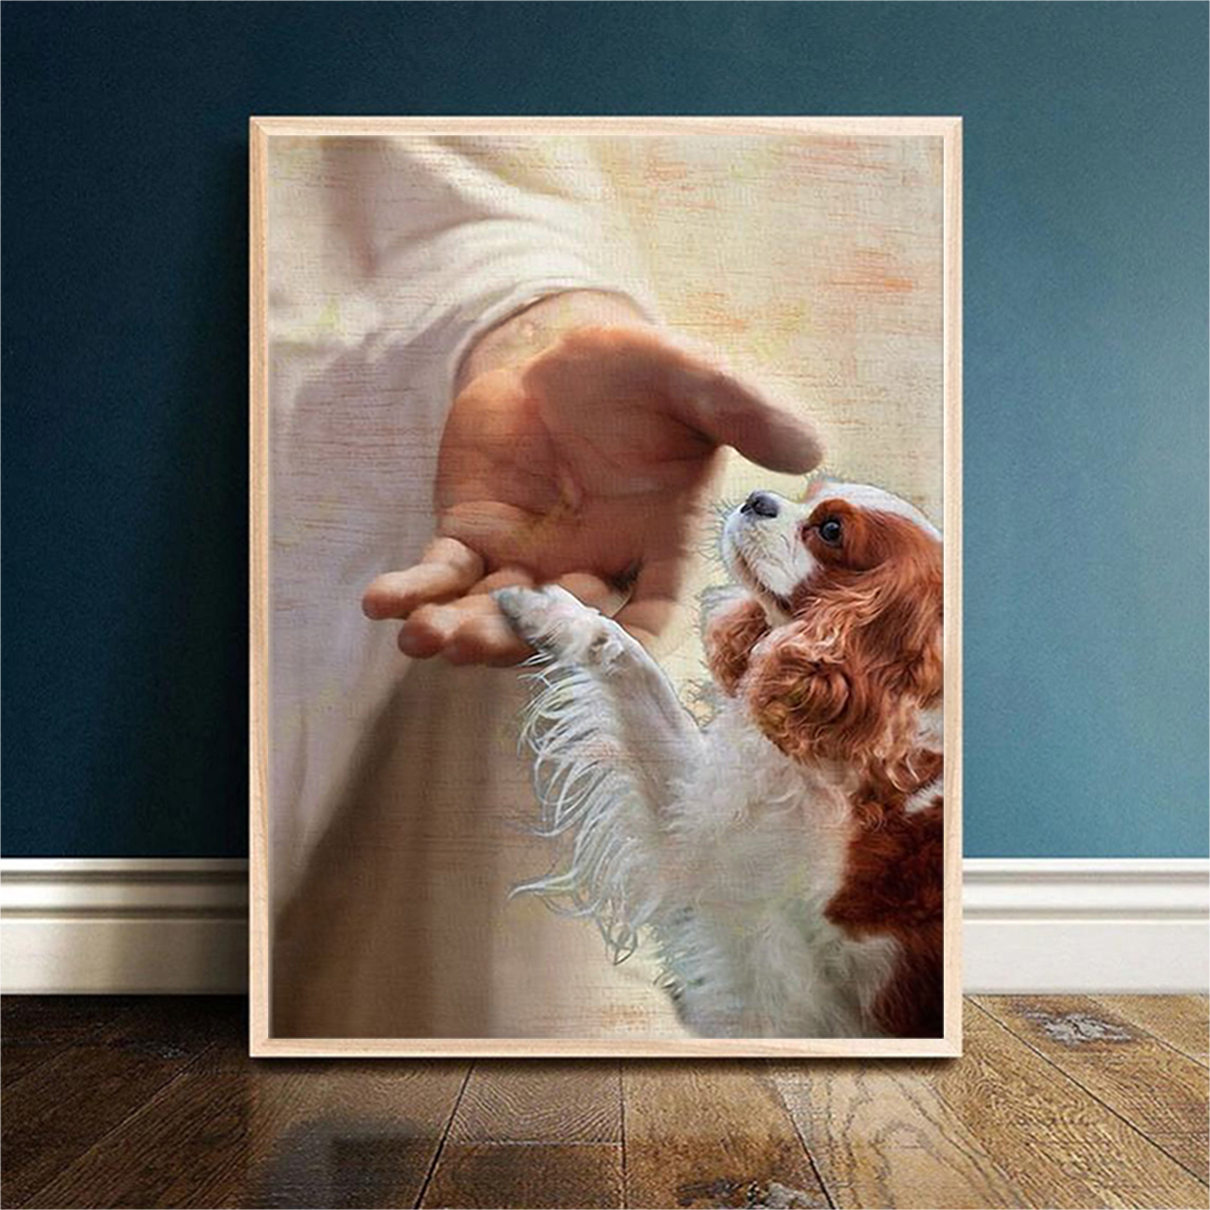 God jesus cavalier king charles spaniel take my hand canvas small